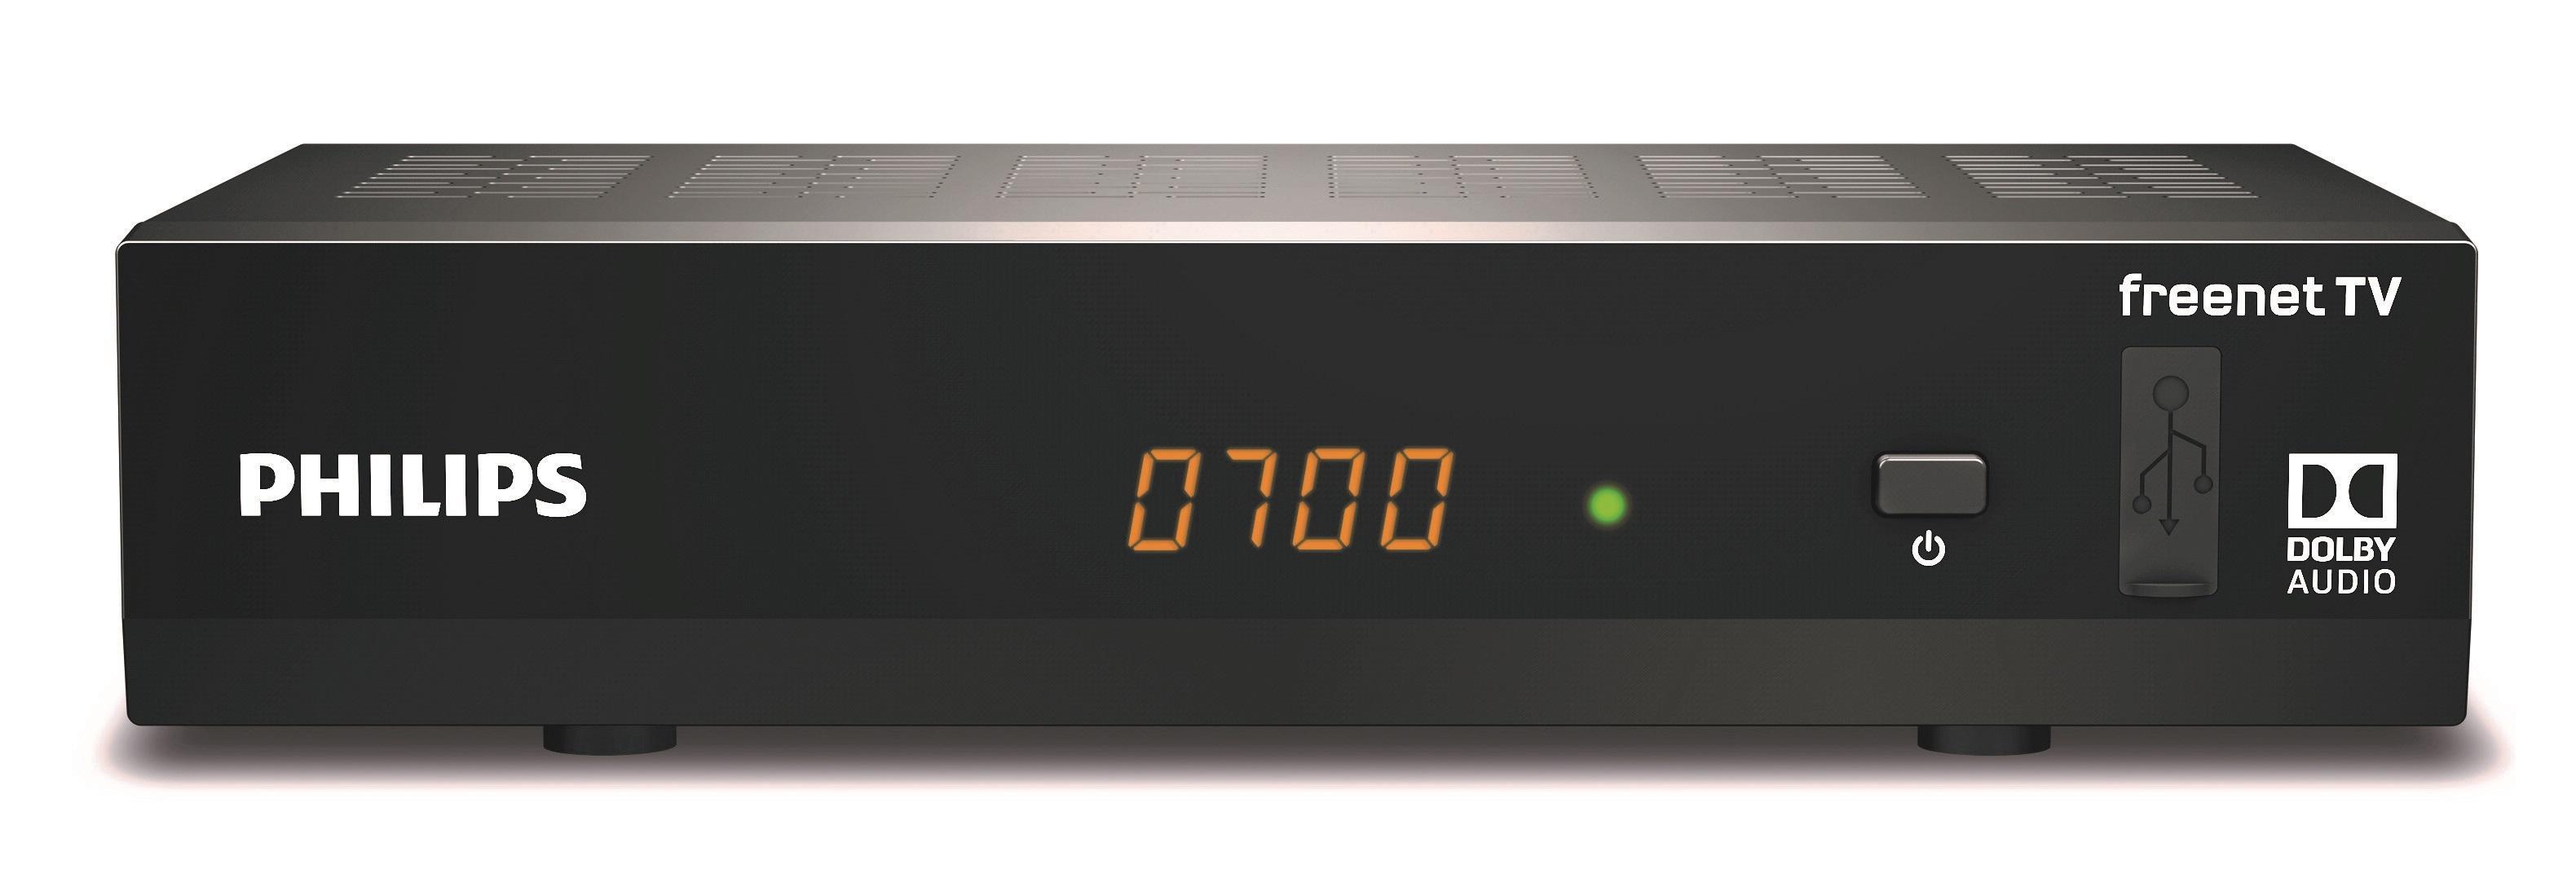 philips dtr3502b digitaler dvb t2 full hd receiver. Black Bedroom Furniture Sets. Home Design Ideas